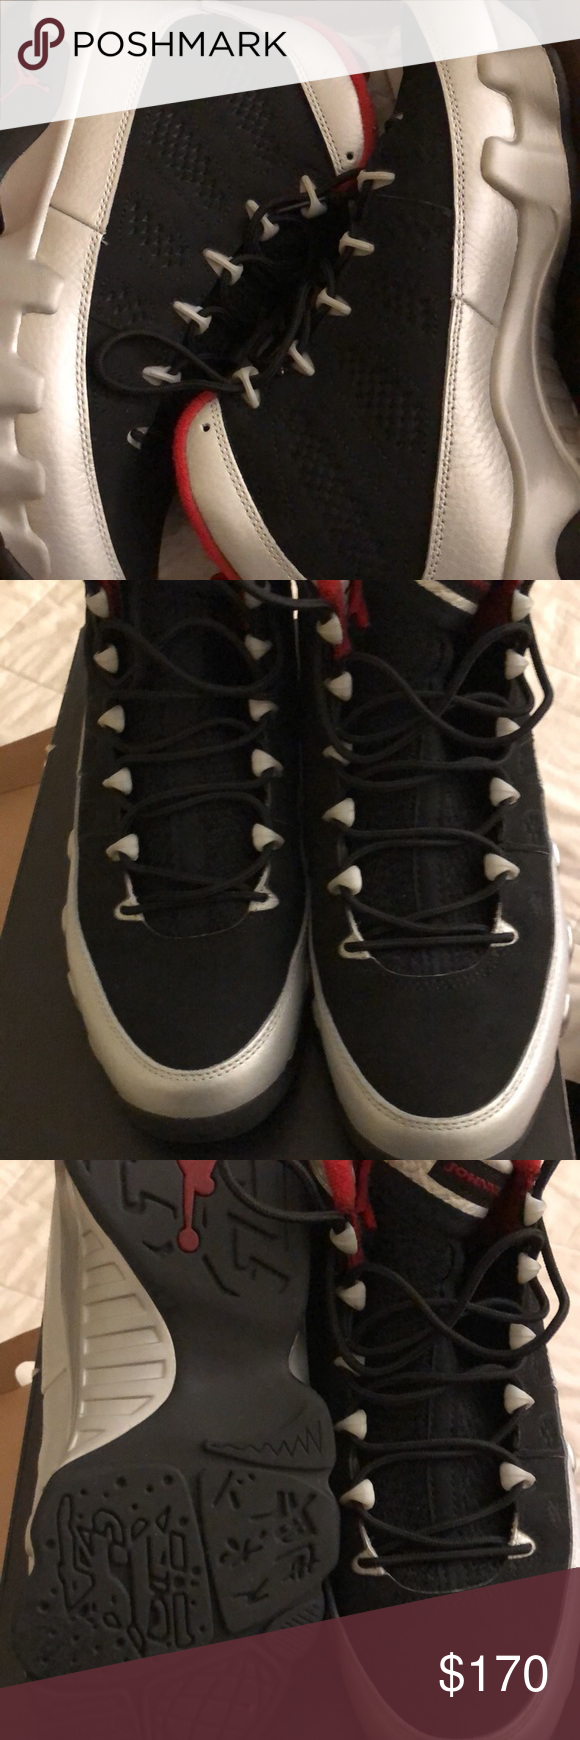 6ade3d7402b Retro Air Jordan 9 Johnny Kilroy Once worn perfect condition Retro 9  Jordan. Men's size 8 Jordan Shoes Sneakers